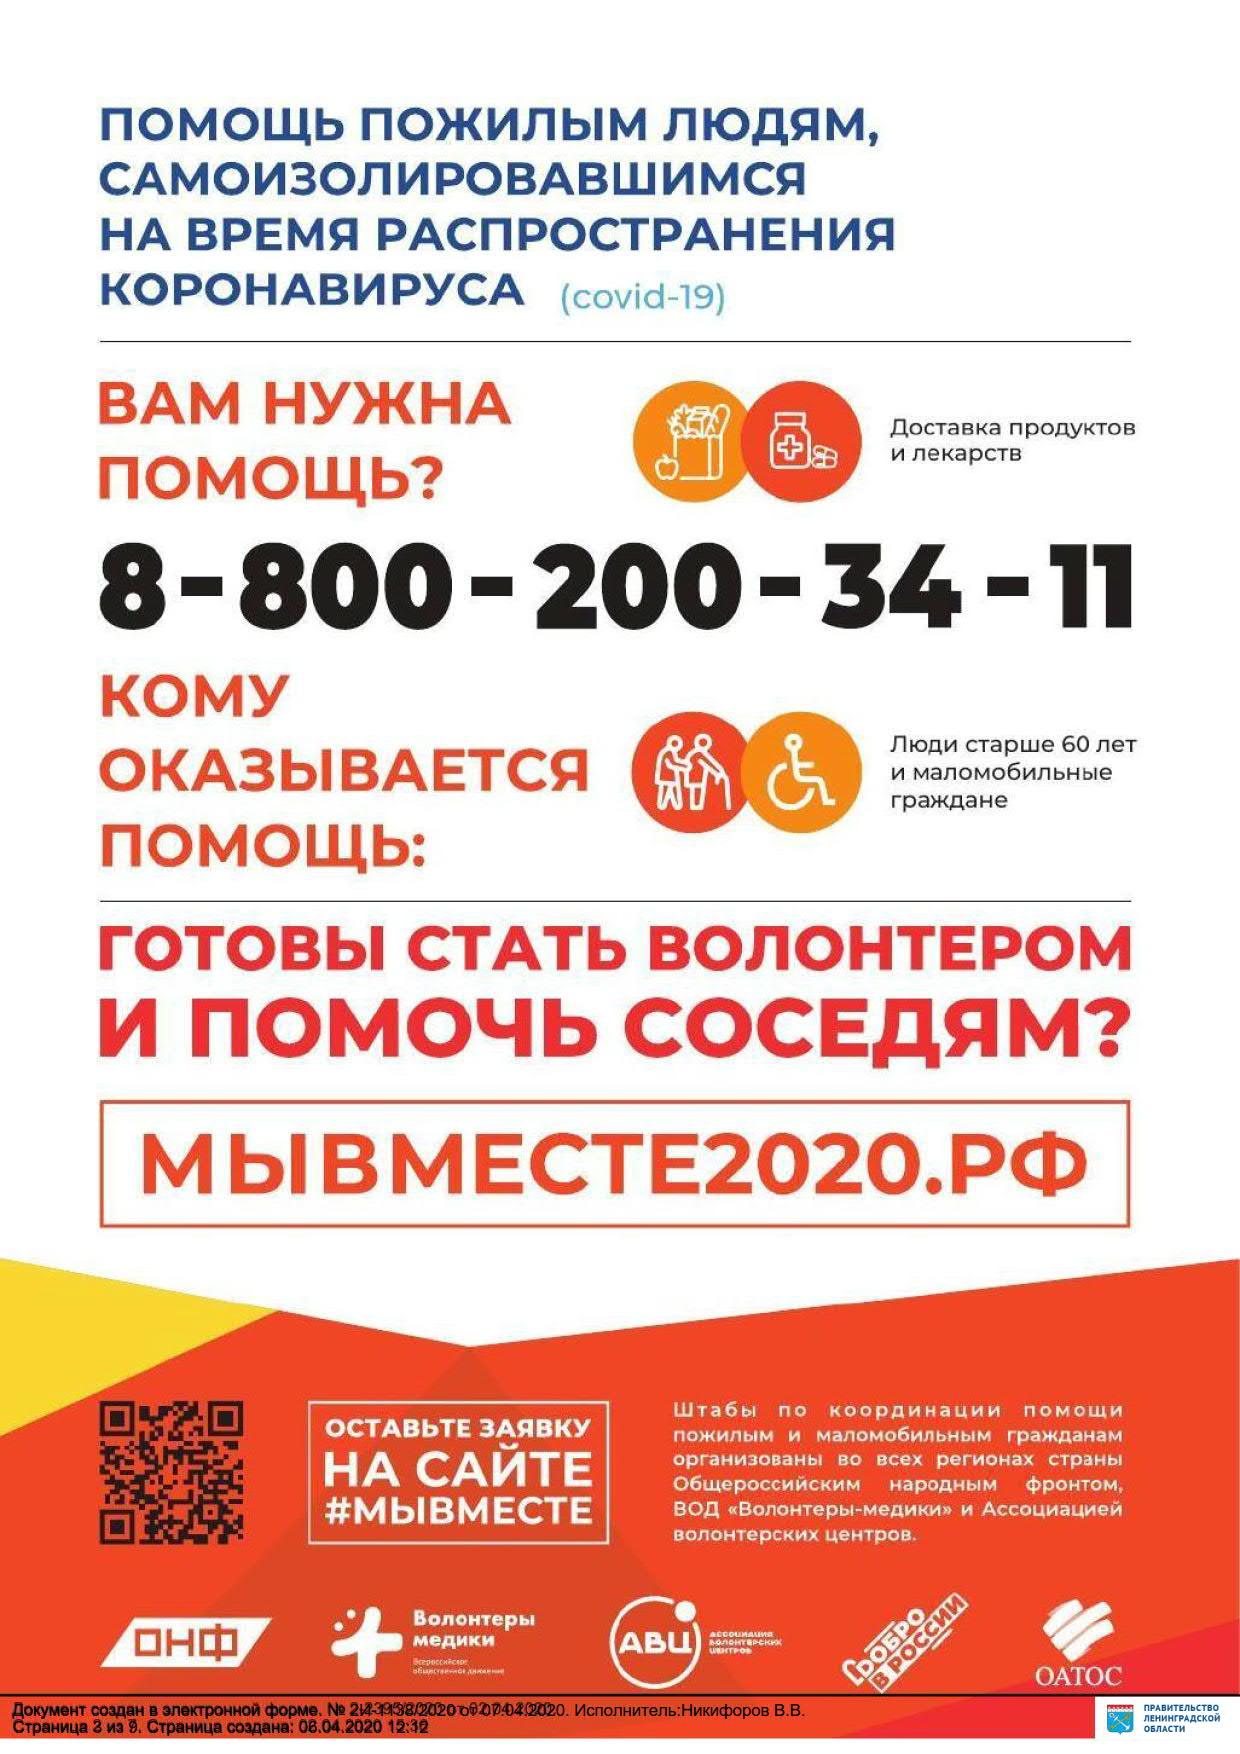 информация по коронавирусу_1